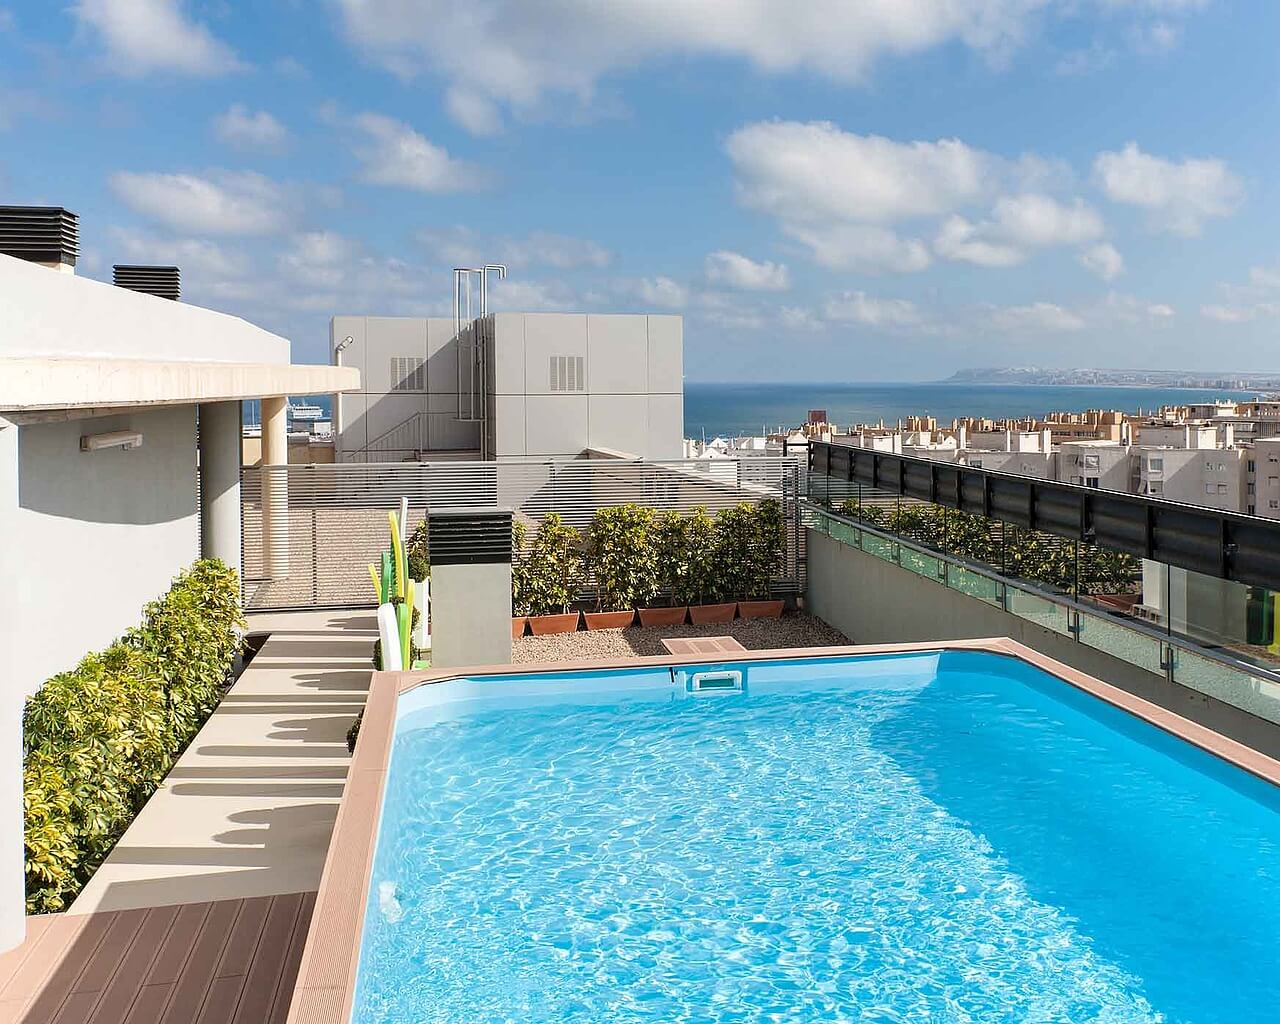 Voyage alicante espagne voyages my europa for Hotel design espagne